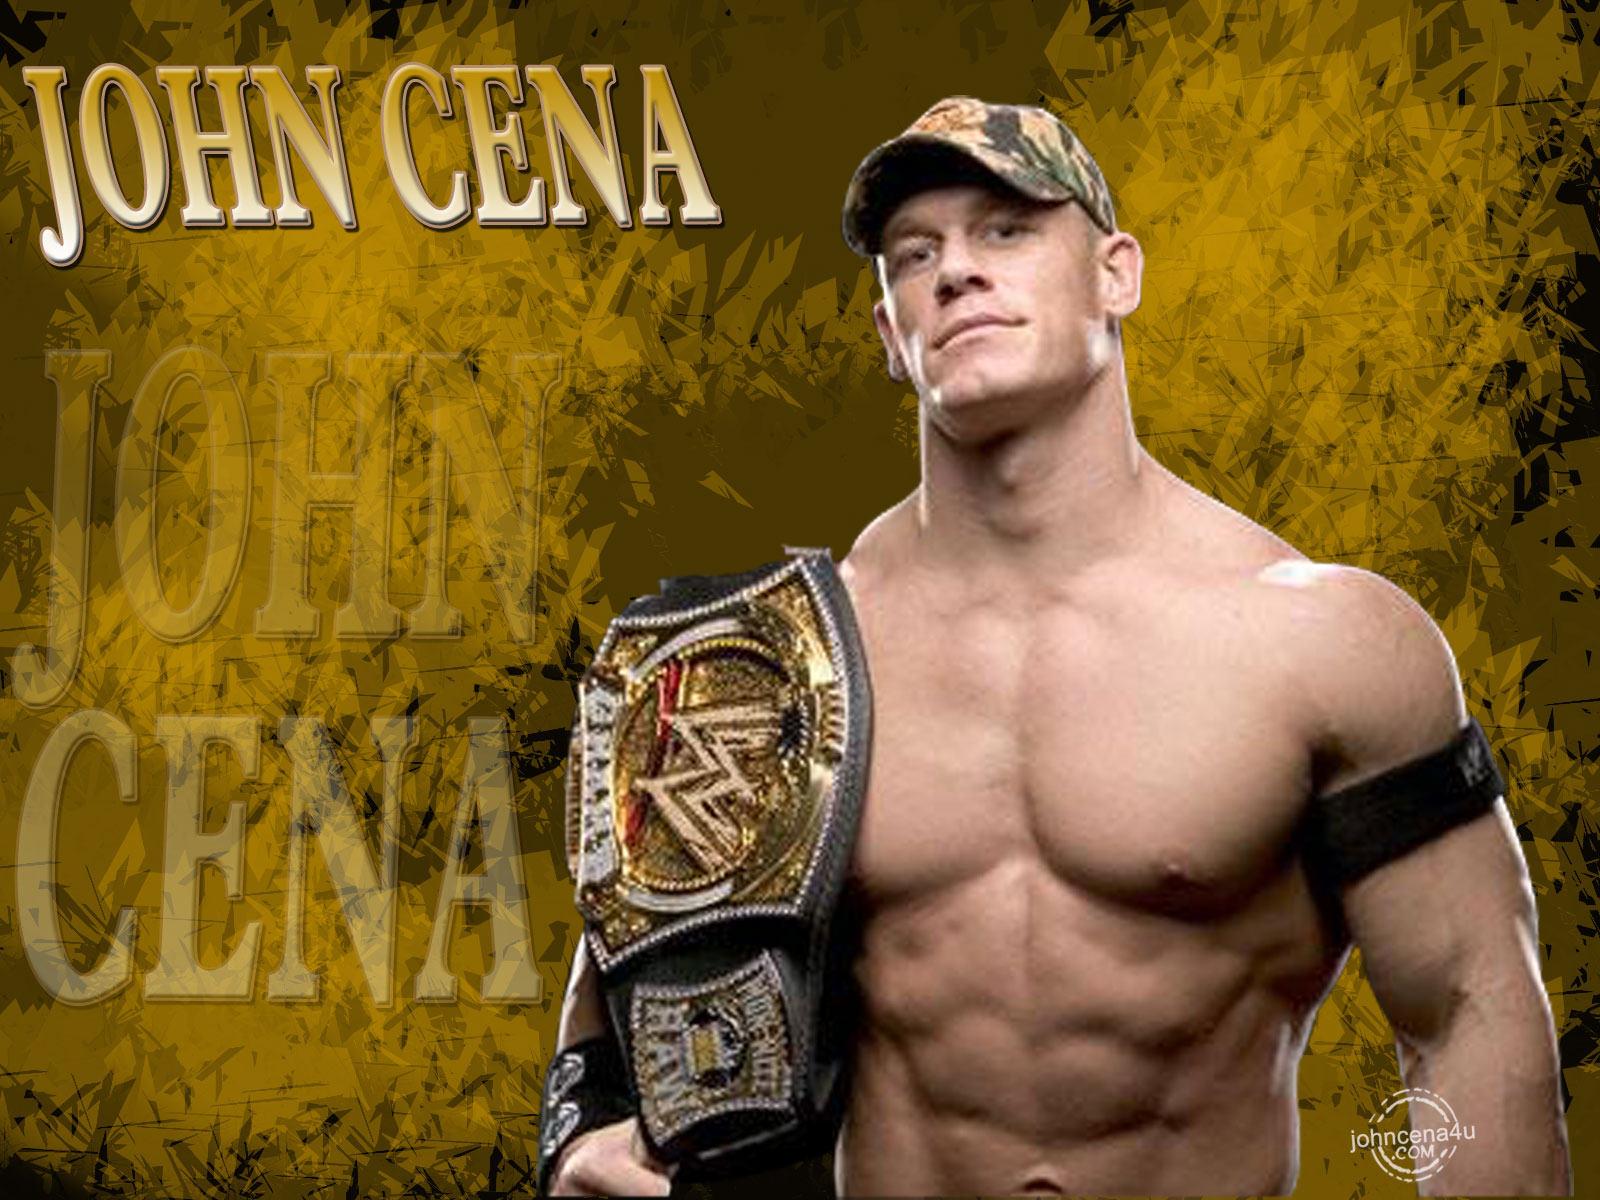 John Cena Wallpaper 1600x1200 77021